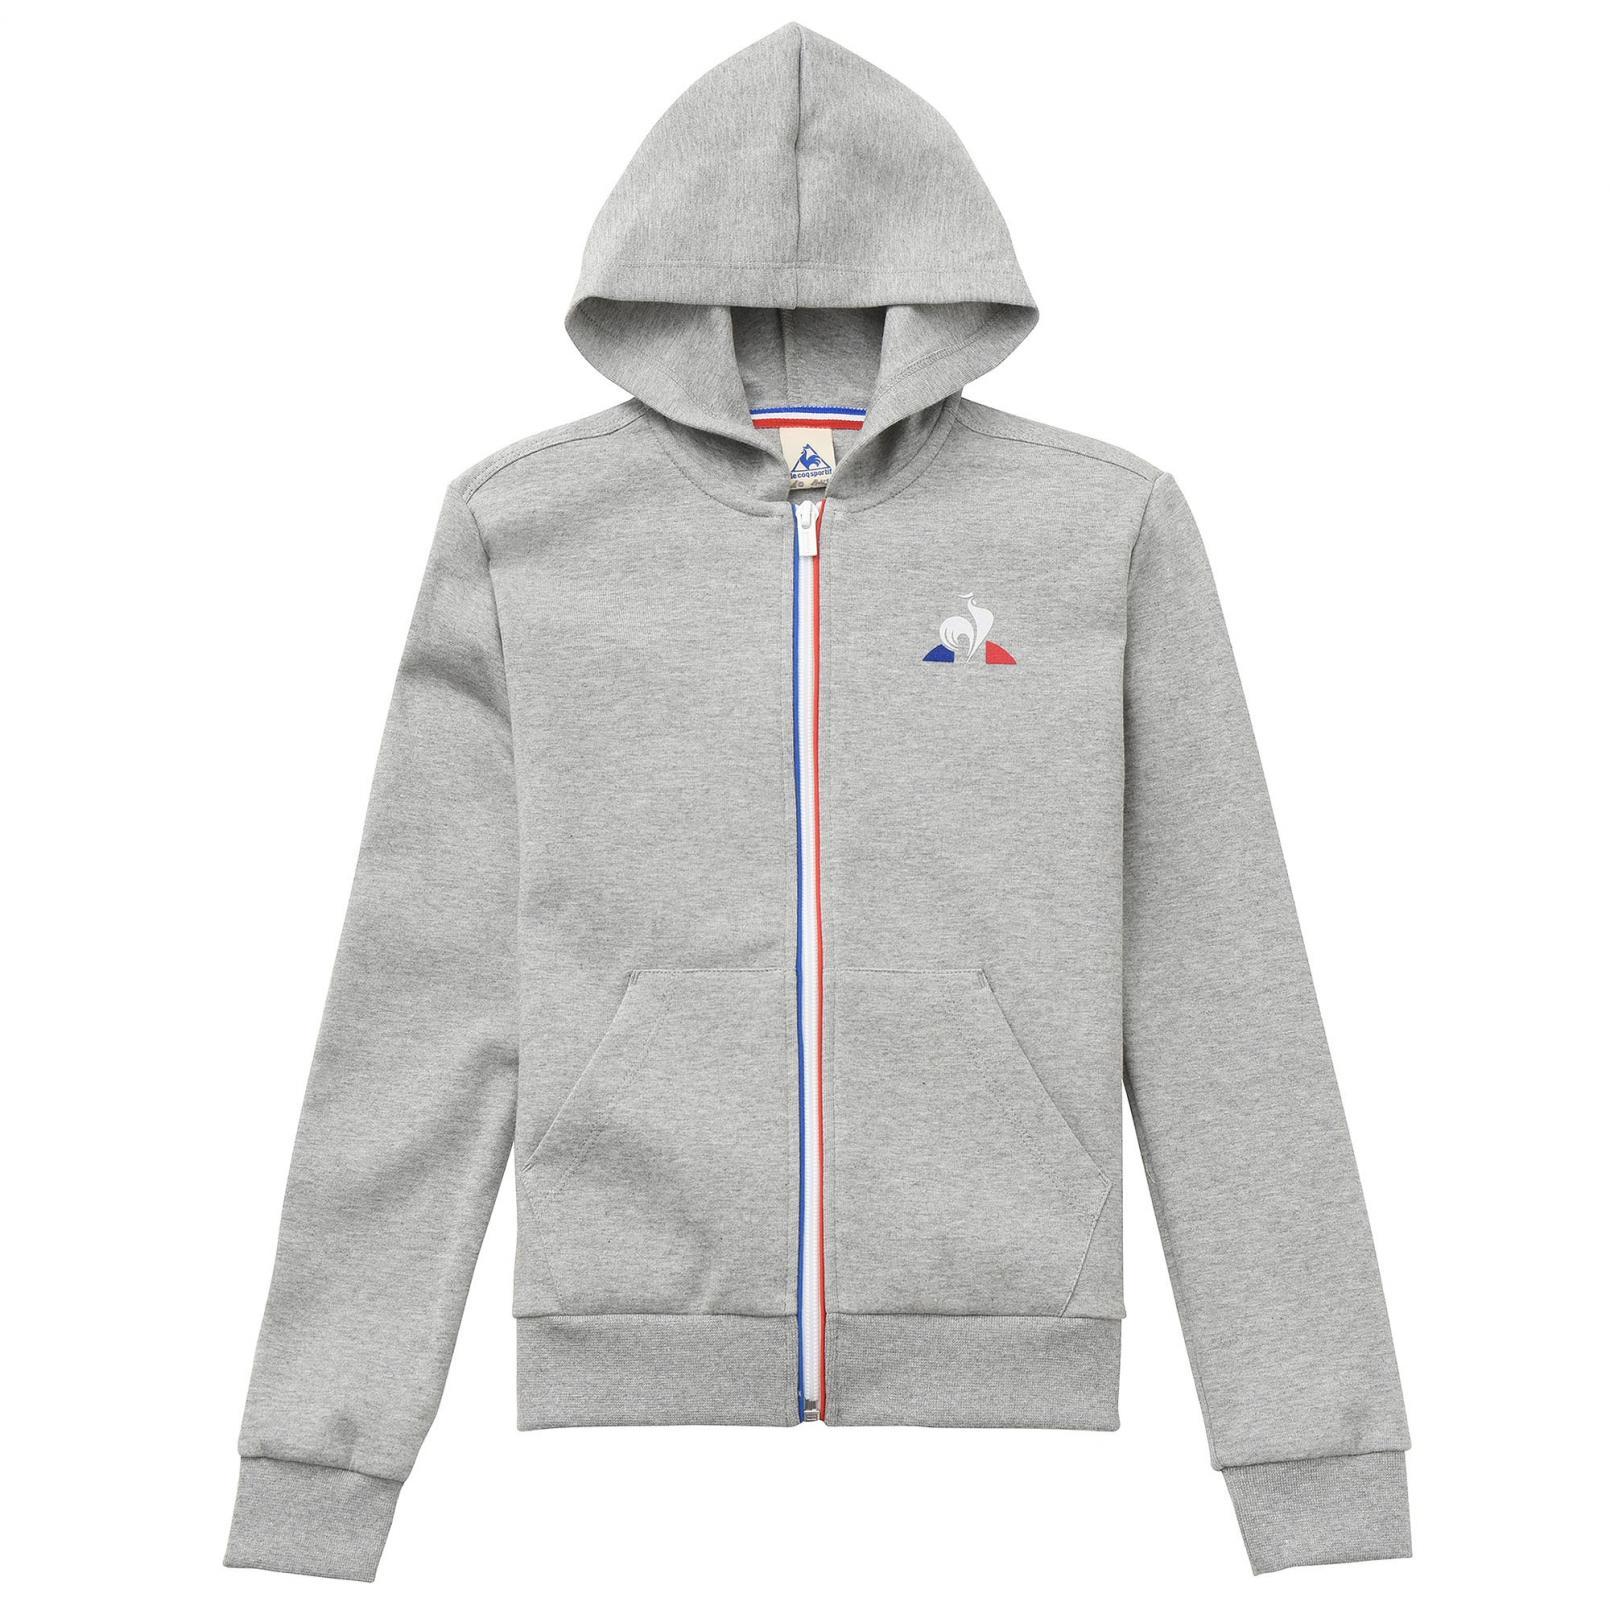 Kids Apparel – Le Coq Sportif Essentiels Full zip hood Grey